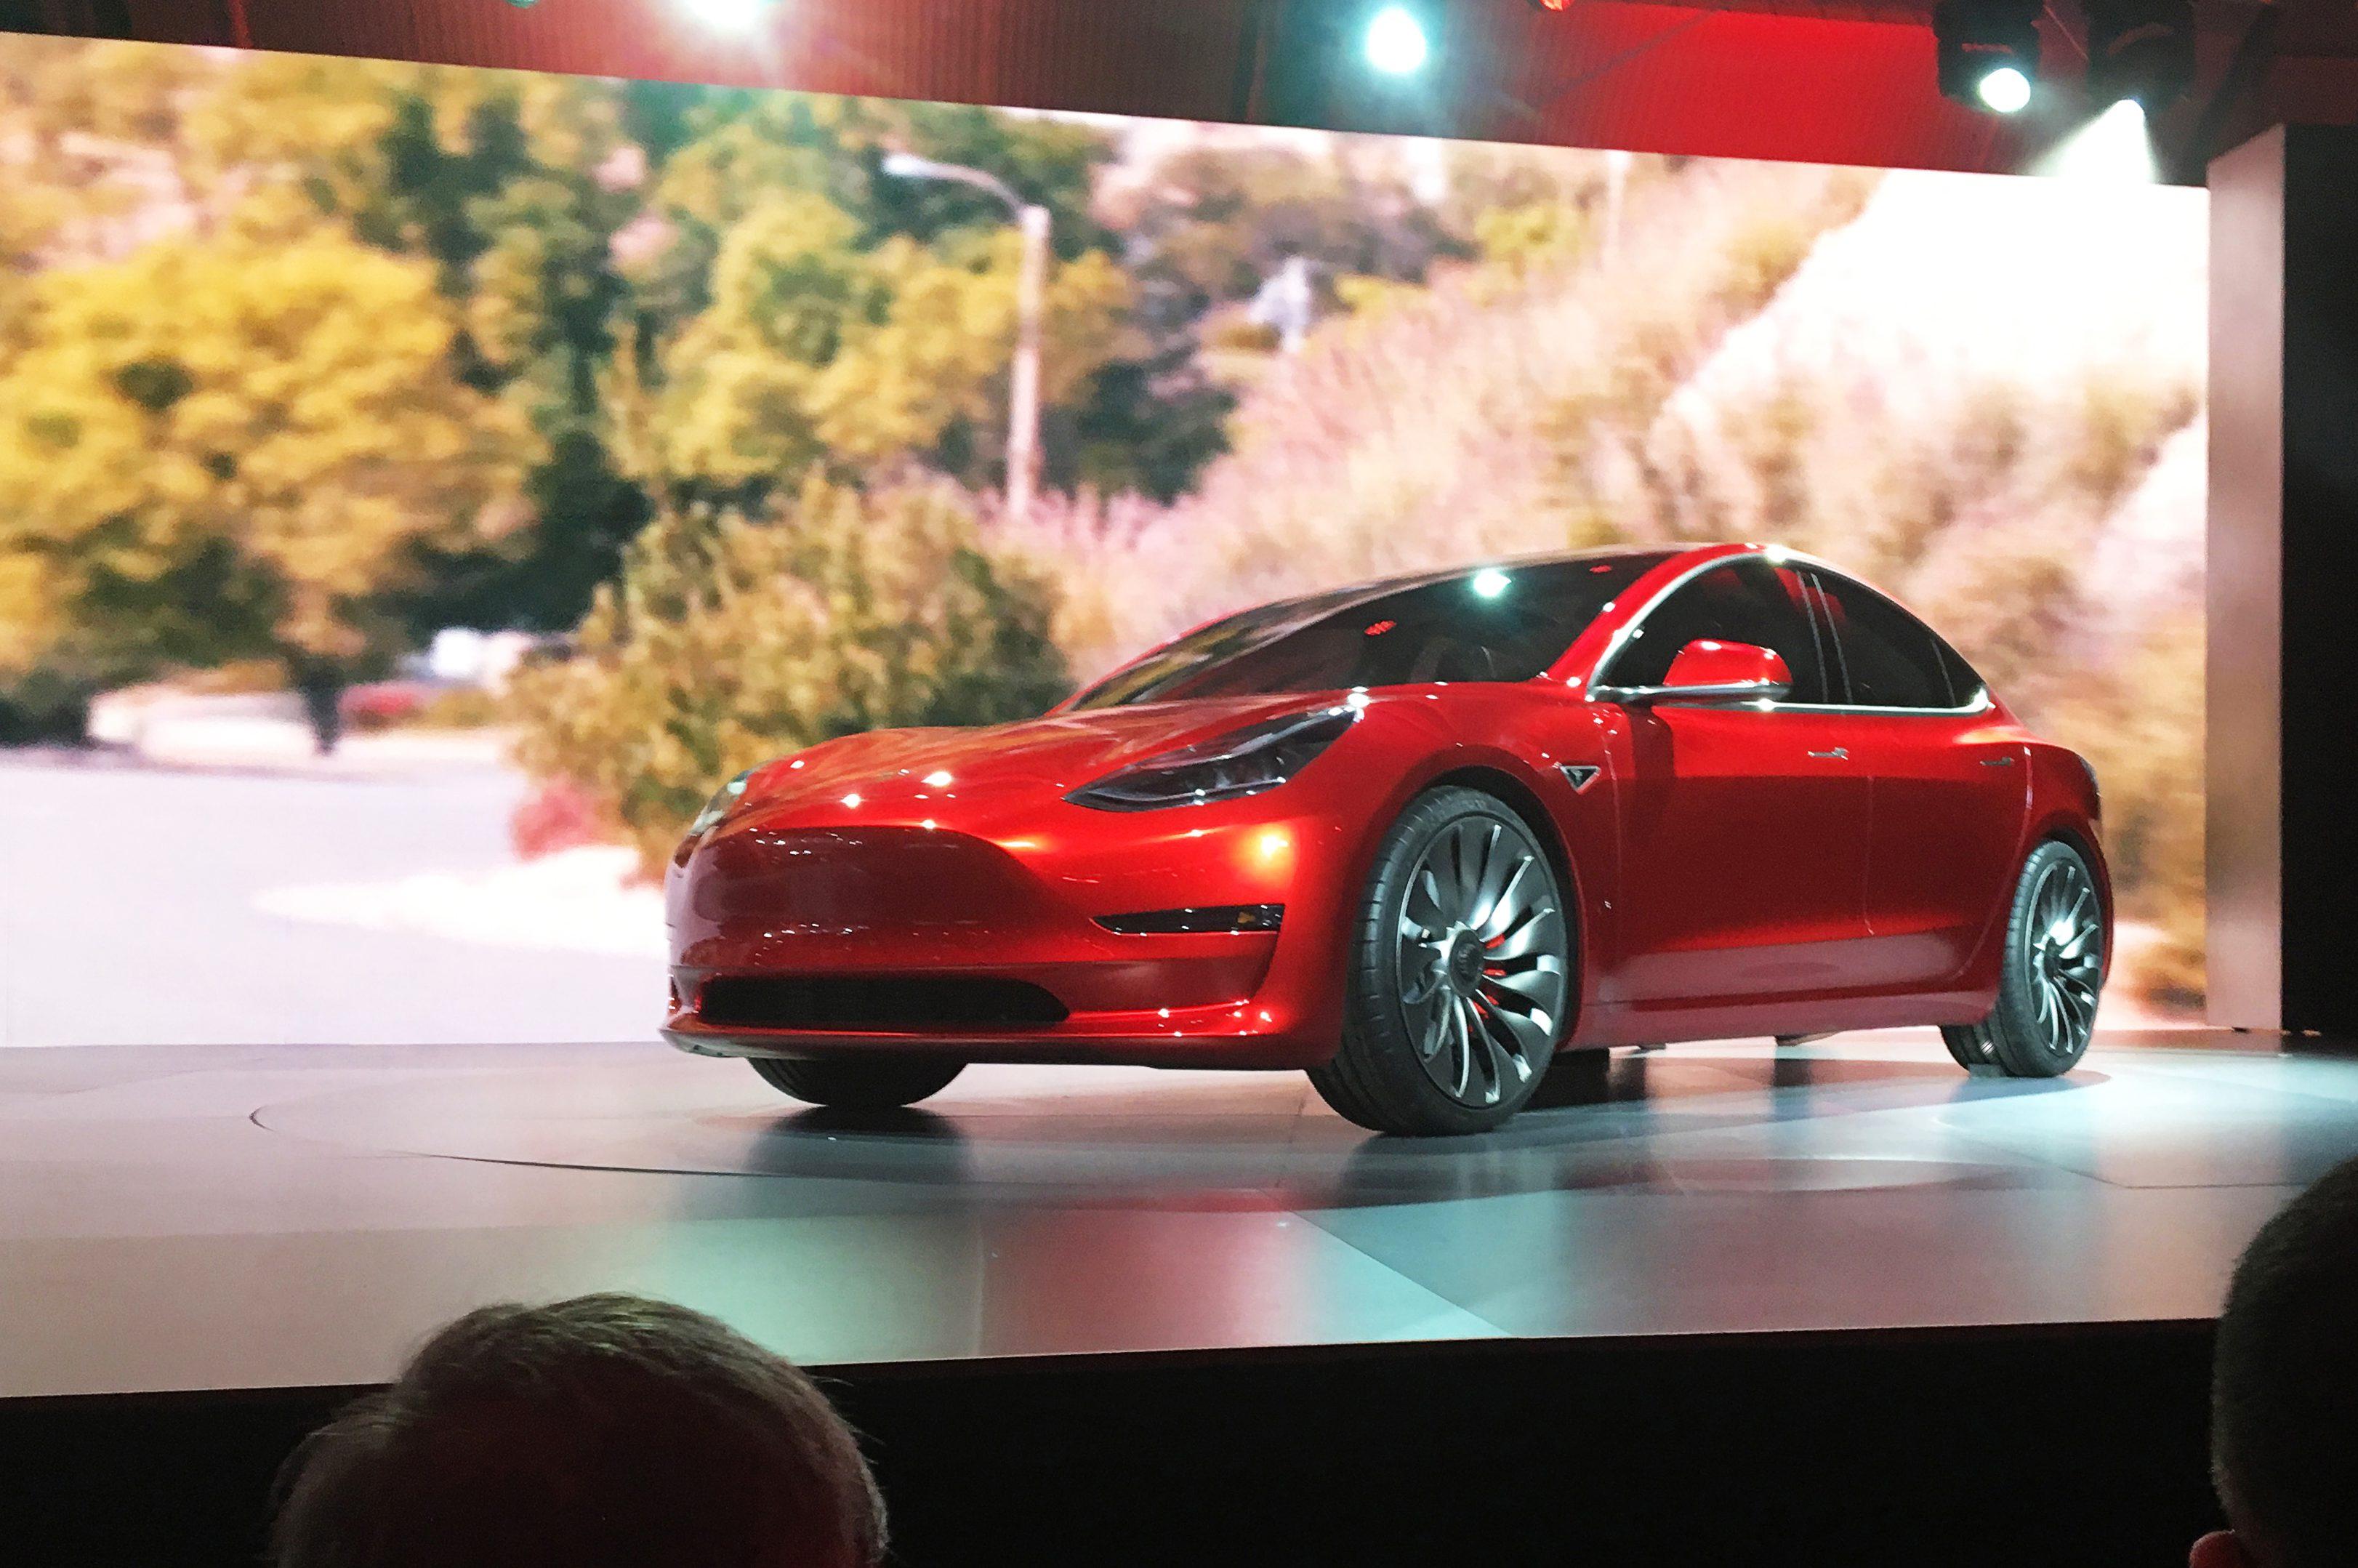 A Tesla Model 3 sedan